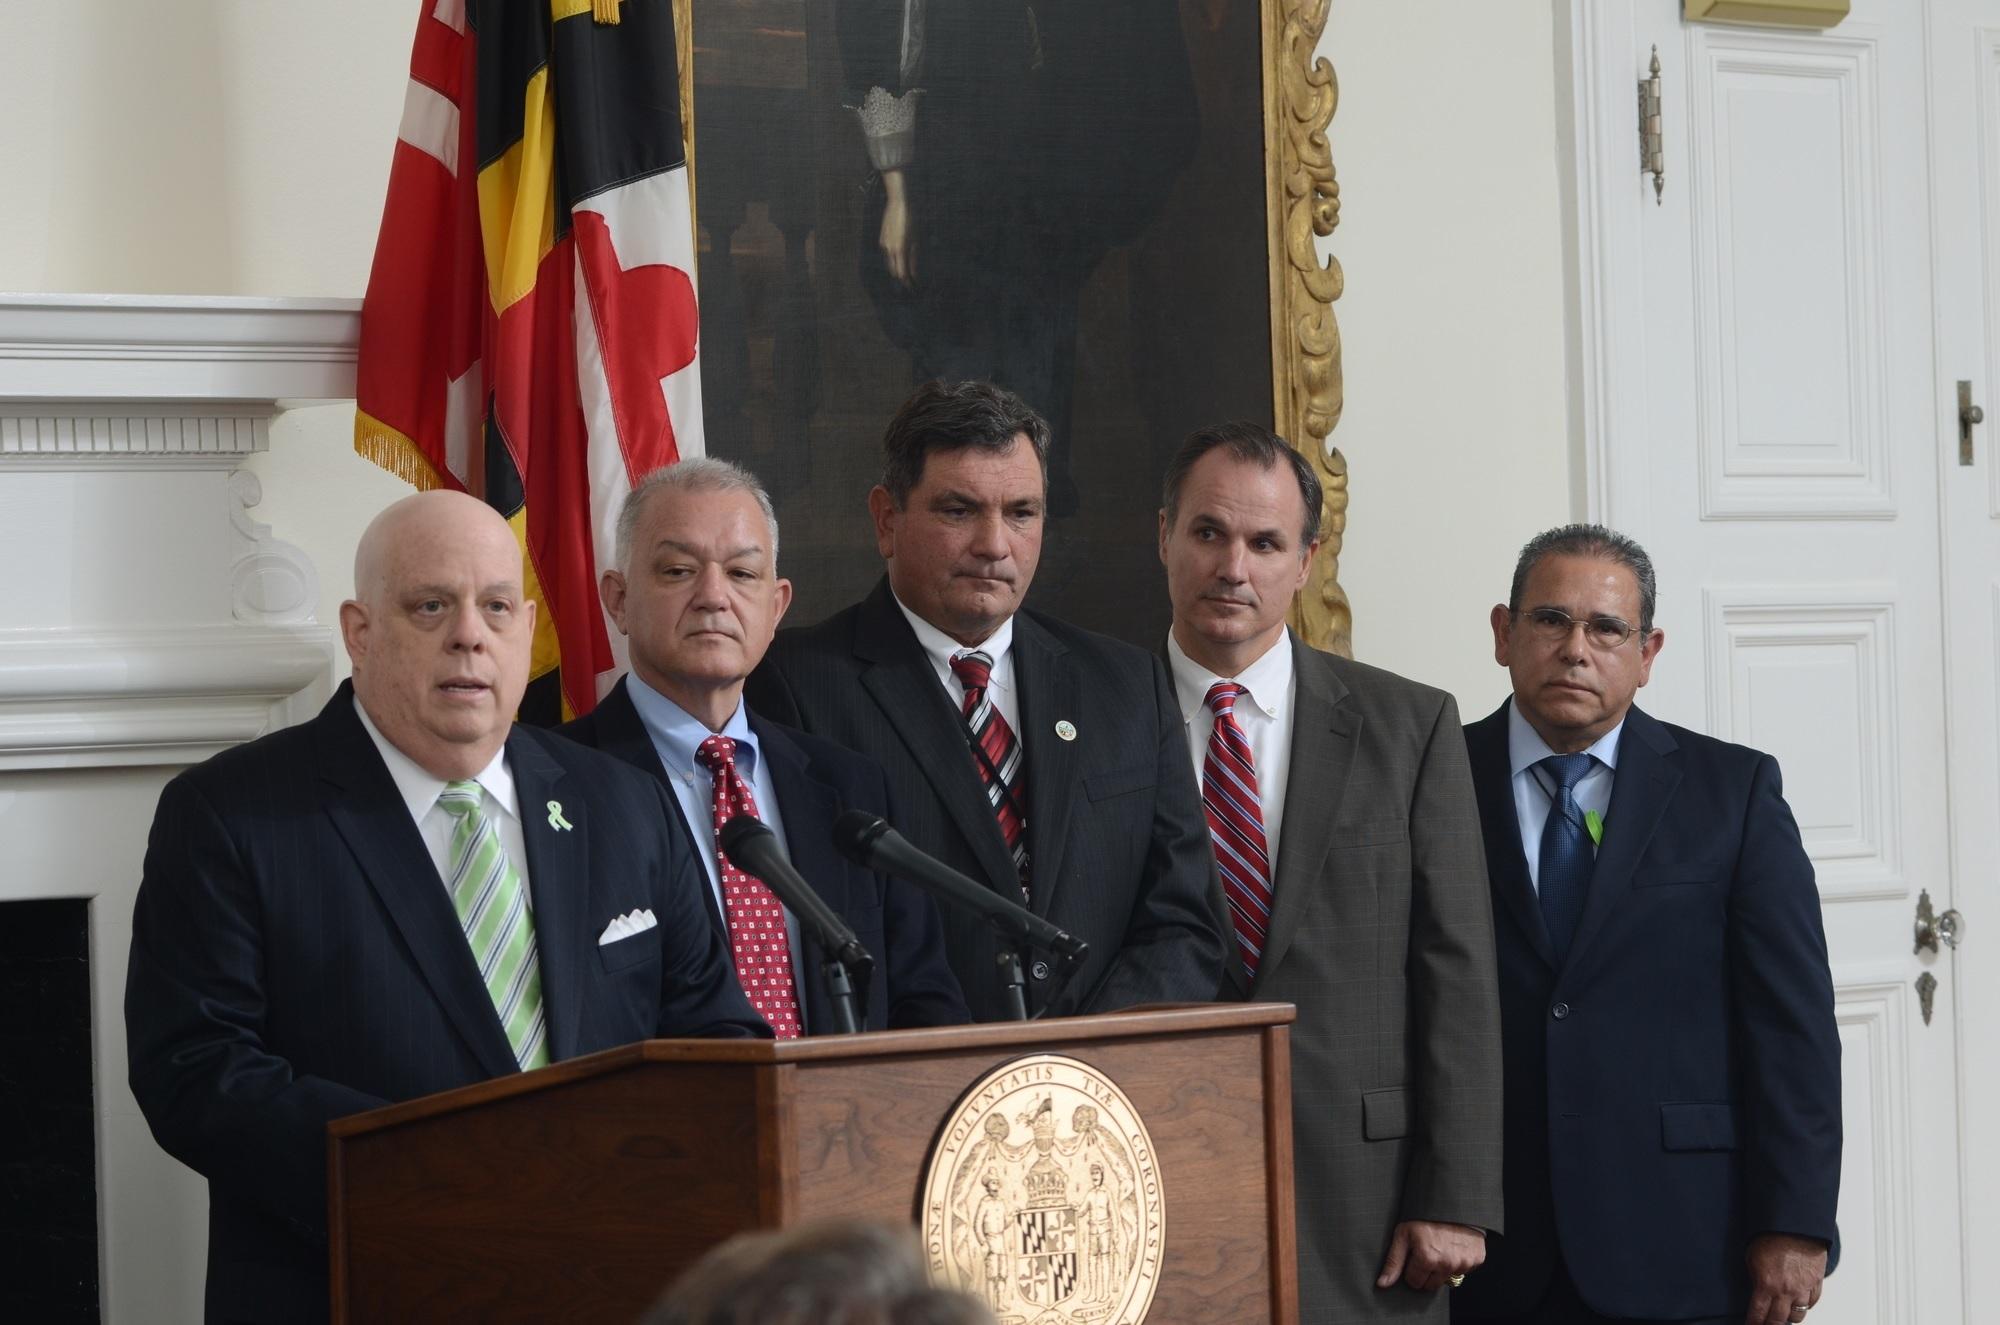 Hogan cuts fees across agencies, saving $10 million annually